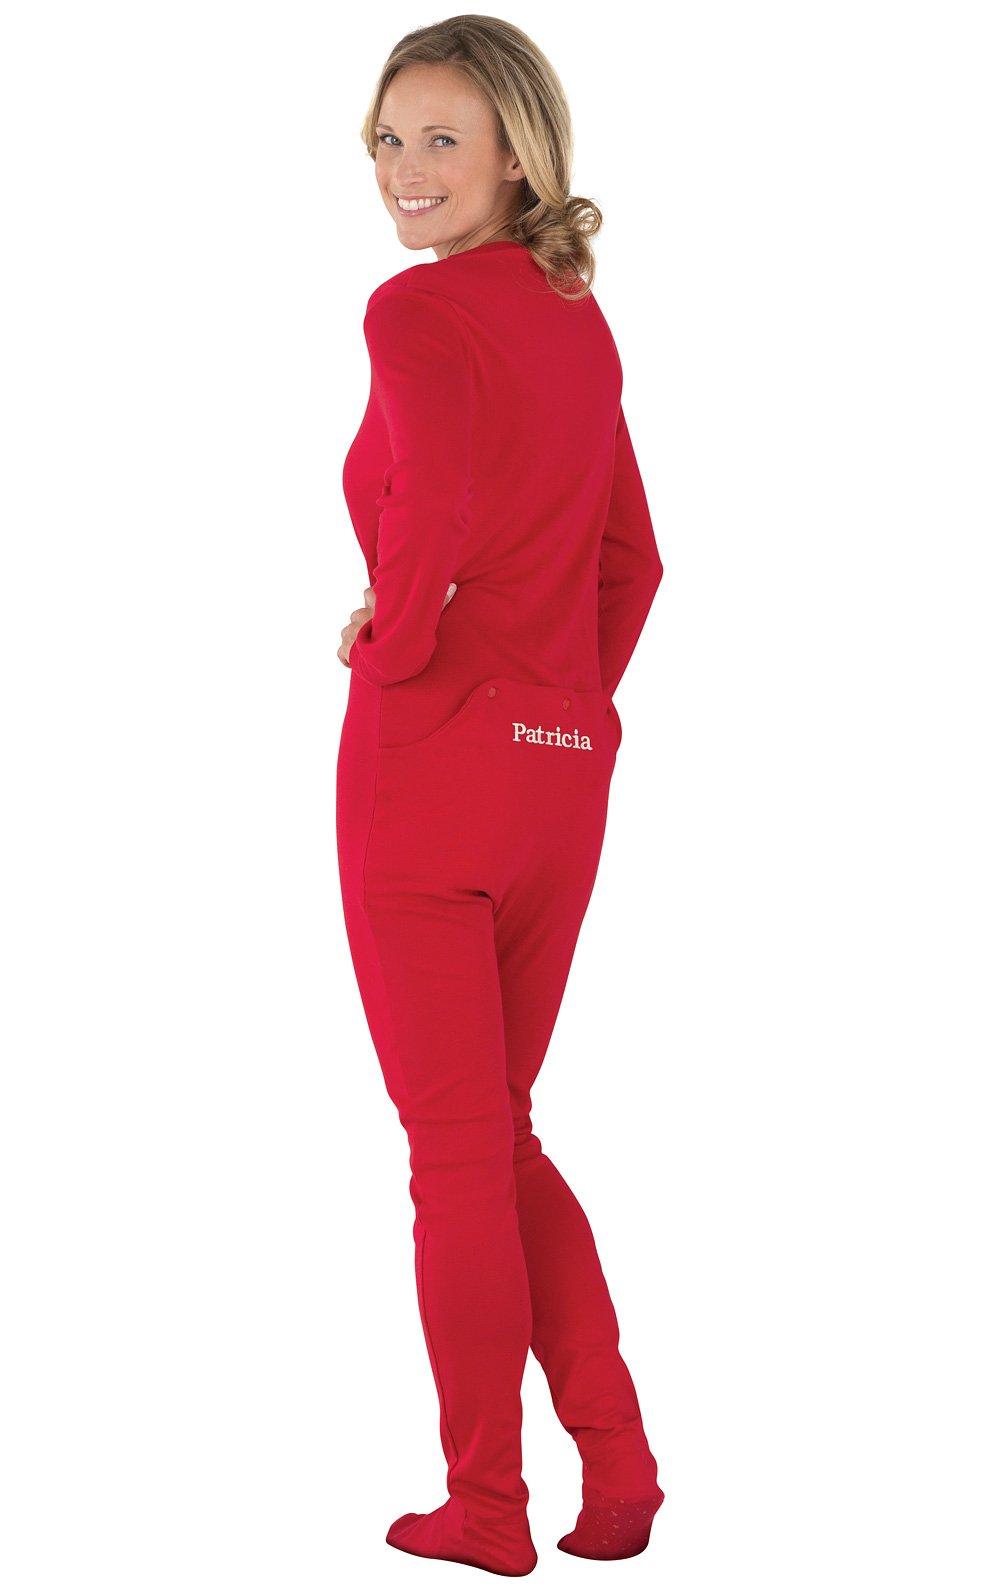 PajamaGram Personalized Women's Cotton Dropseat Footie Pajamas, Red, LRG (12-14)